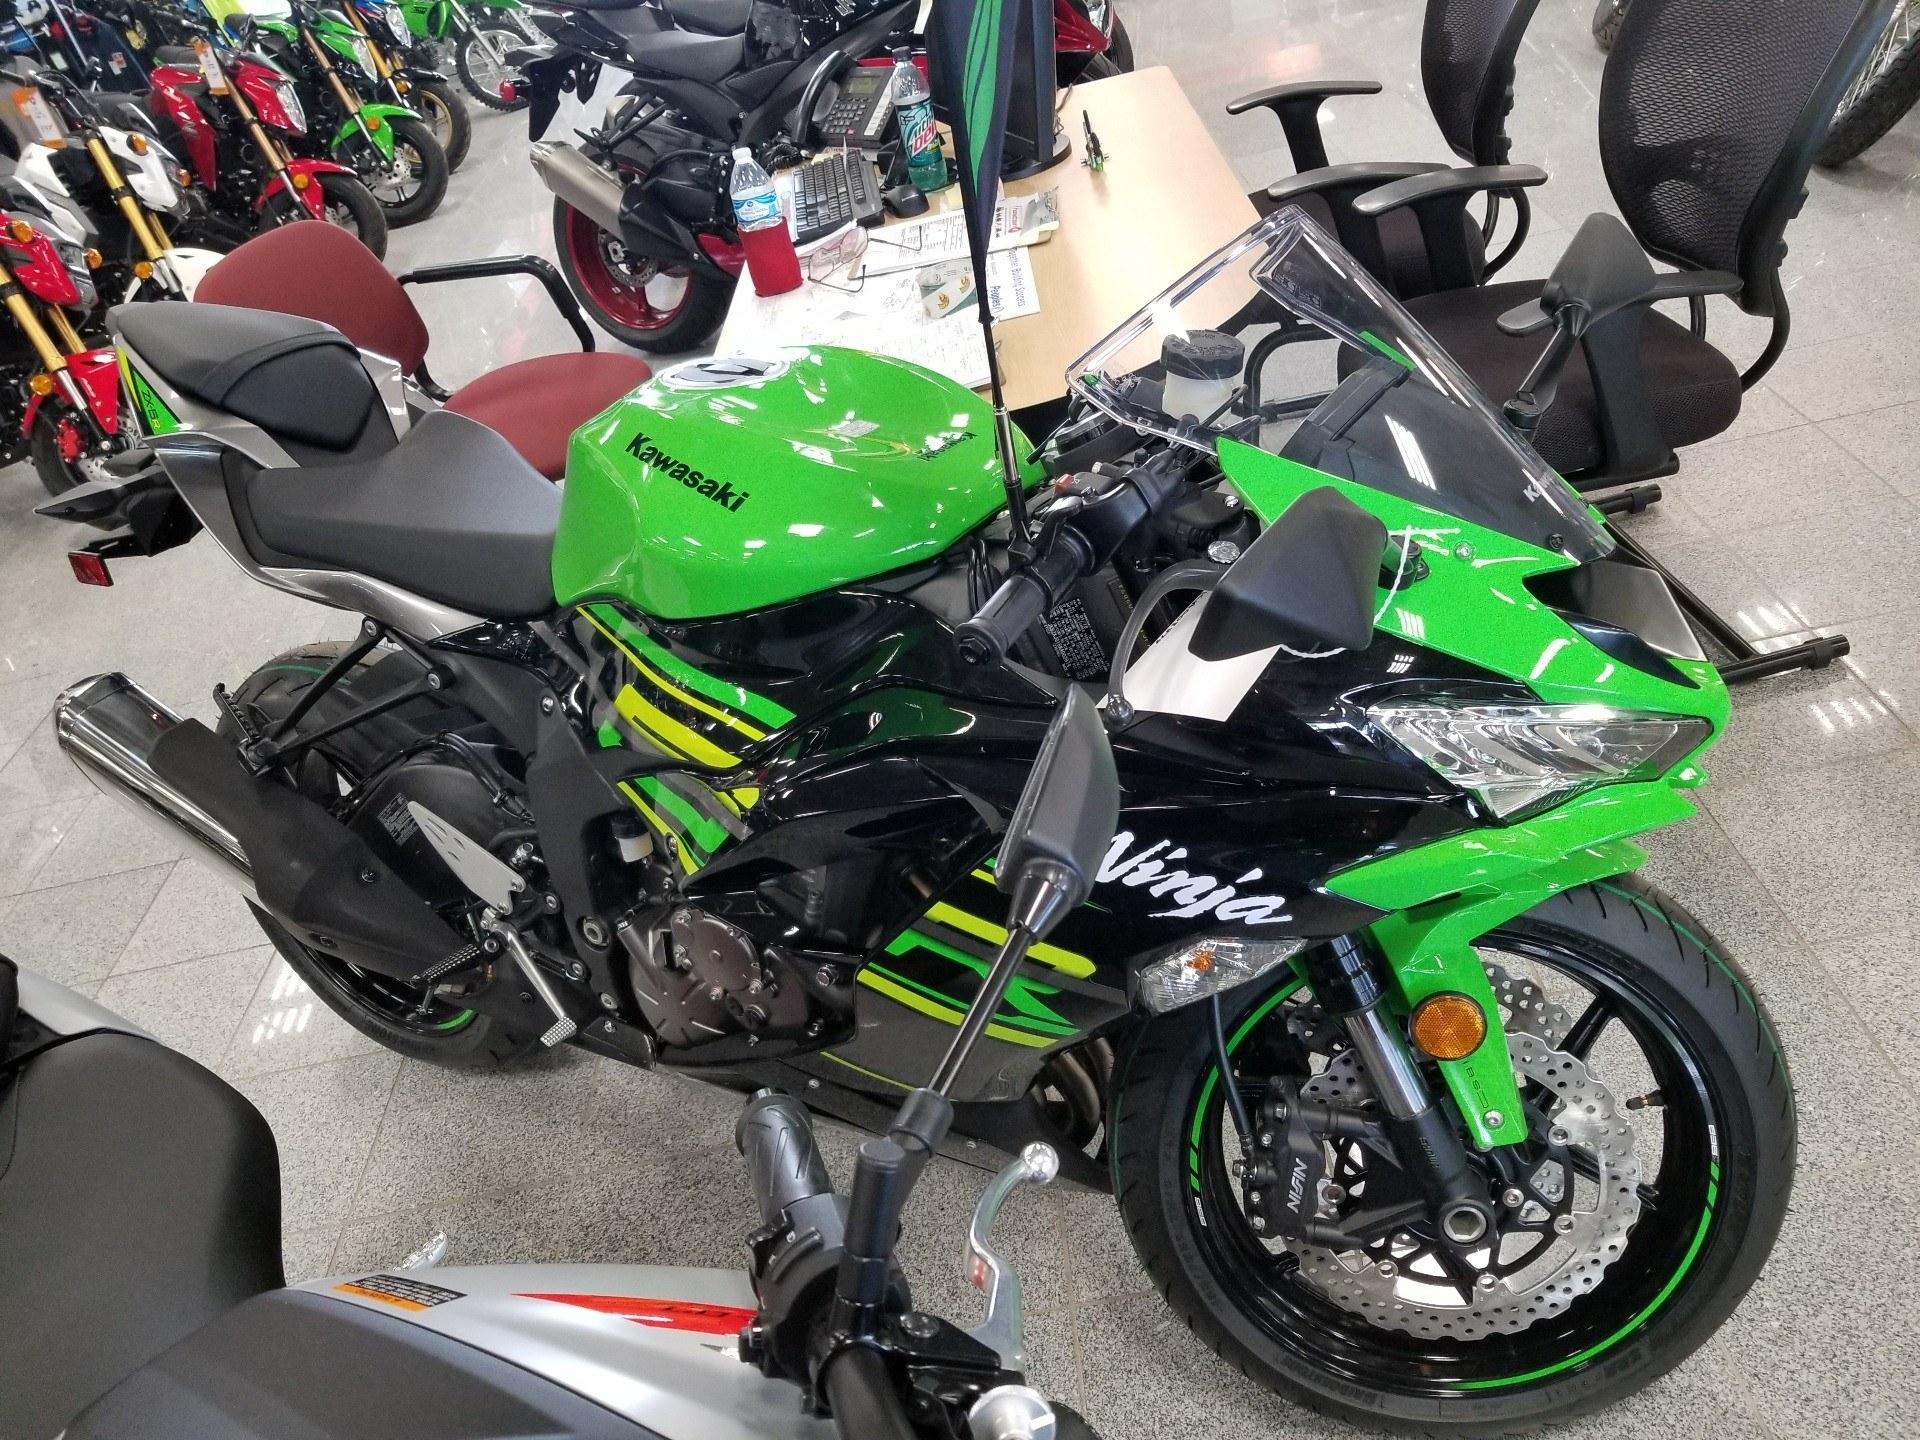 New 2019 Kawasaki Ninja Zx 6r Abs Krt Edition Motorcycles